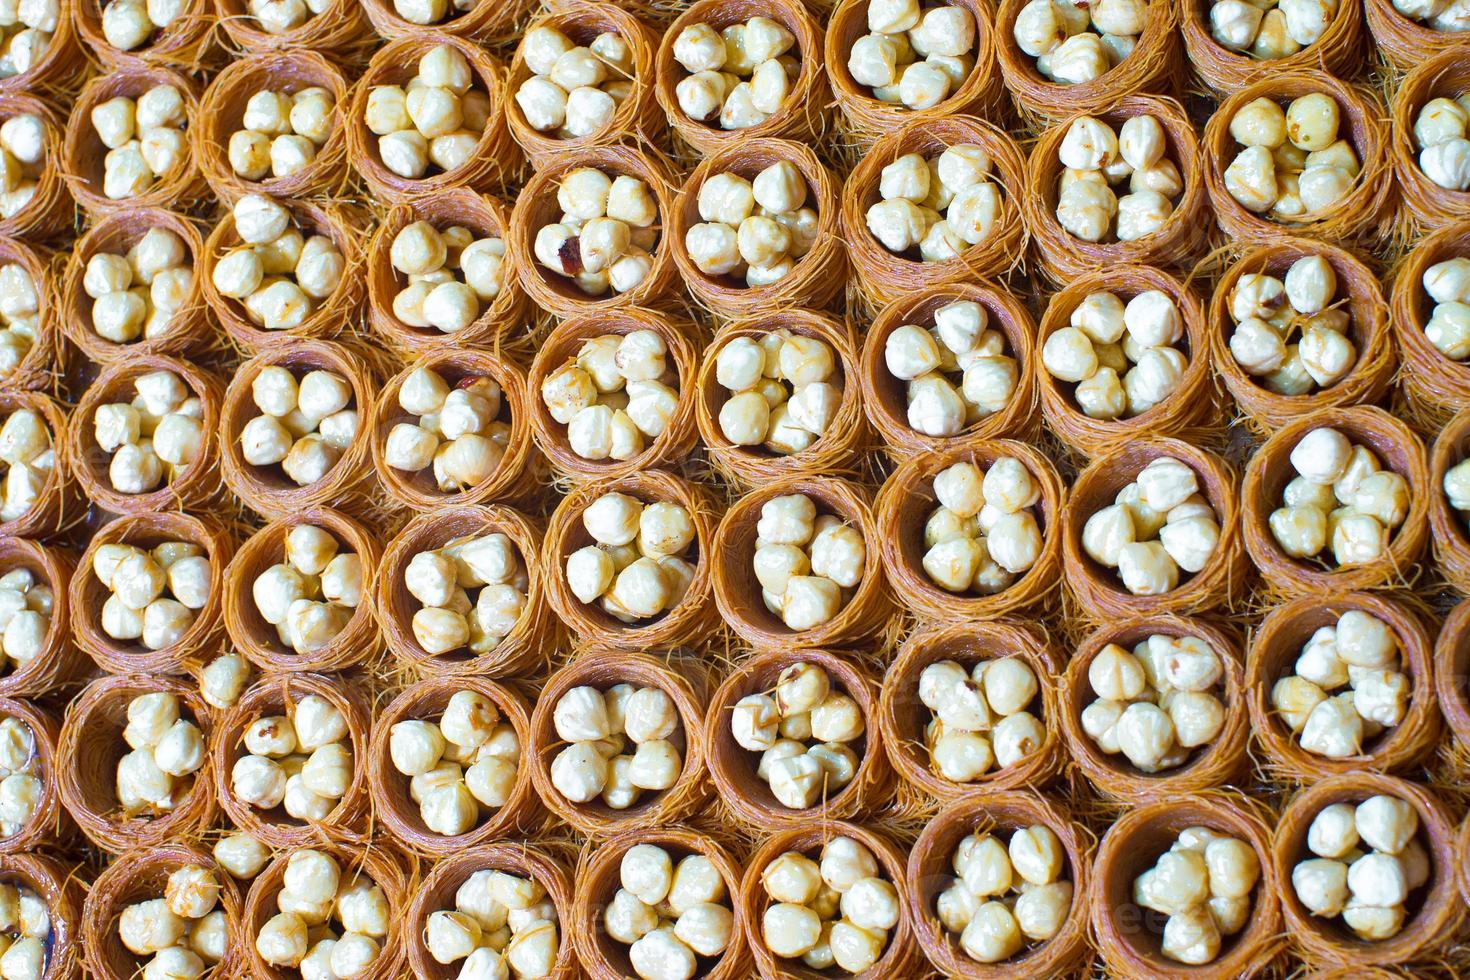 doces turcos tradicionais no mercado de Istambul foto